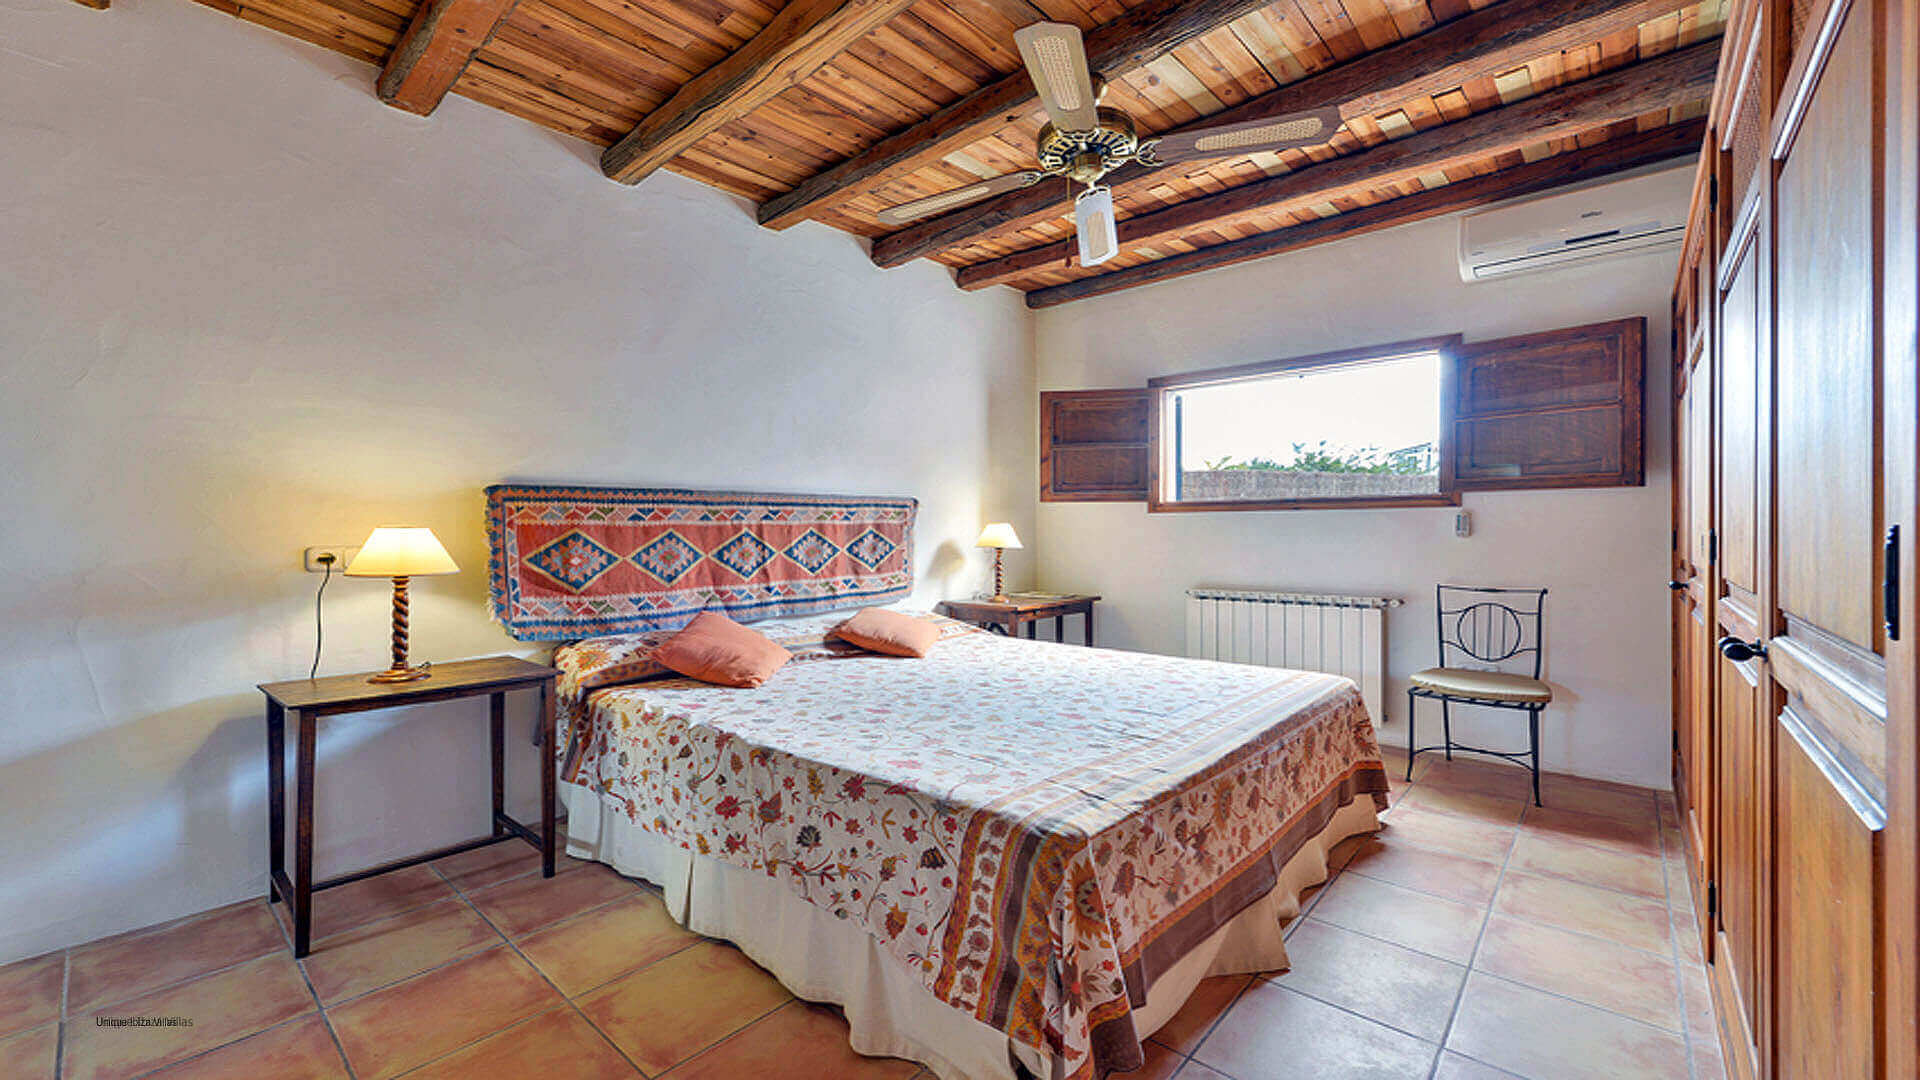 Villa Jaume Dalt Ibiza 17 Bedroom 1